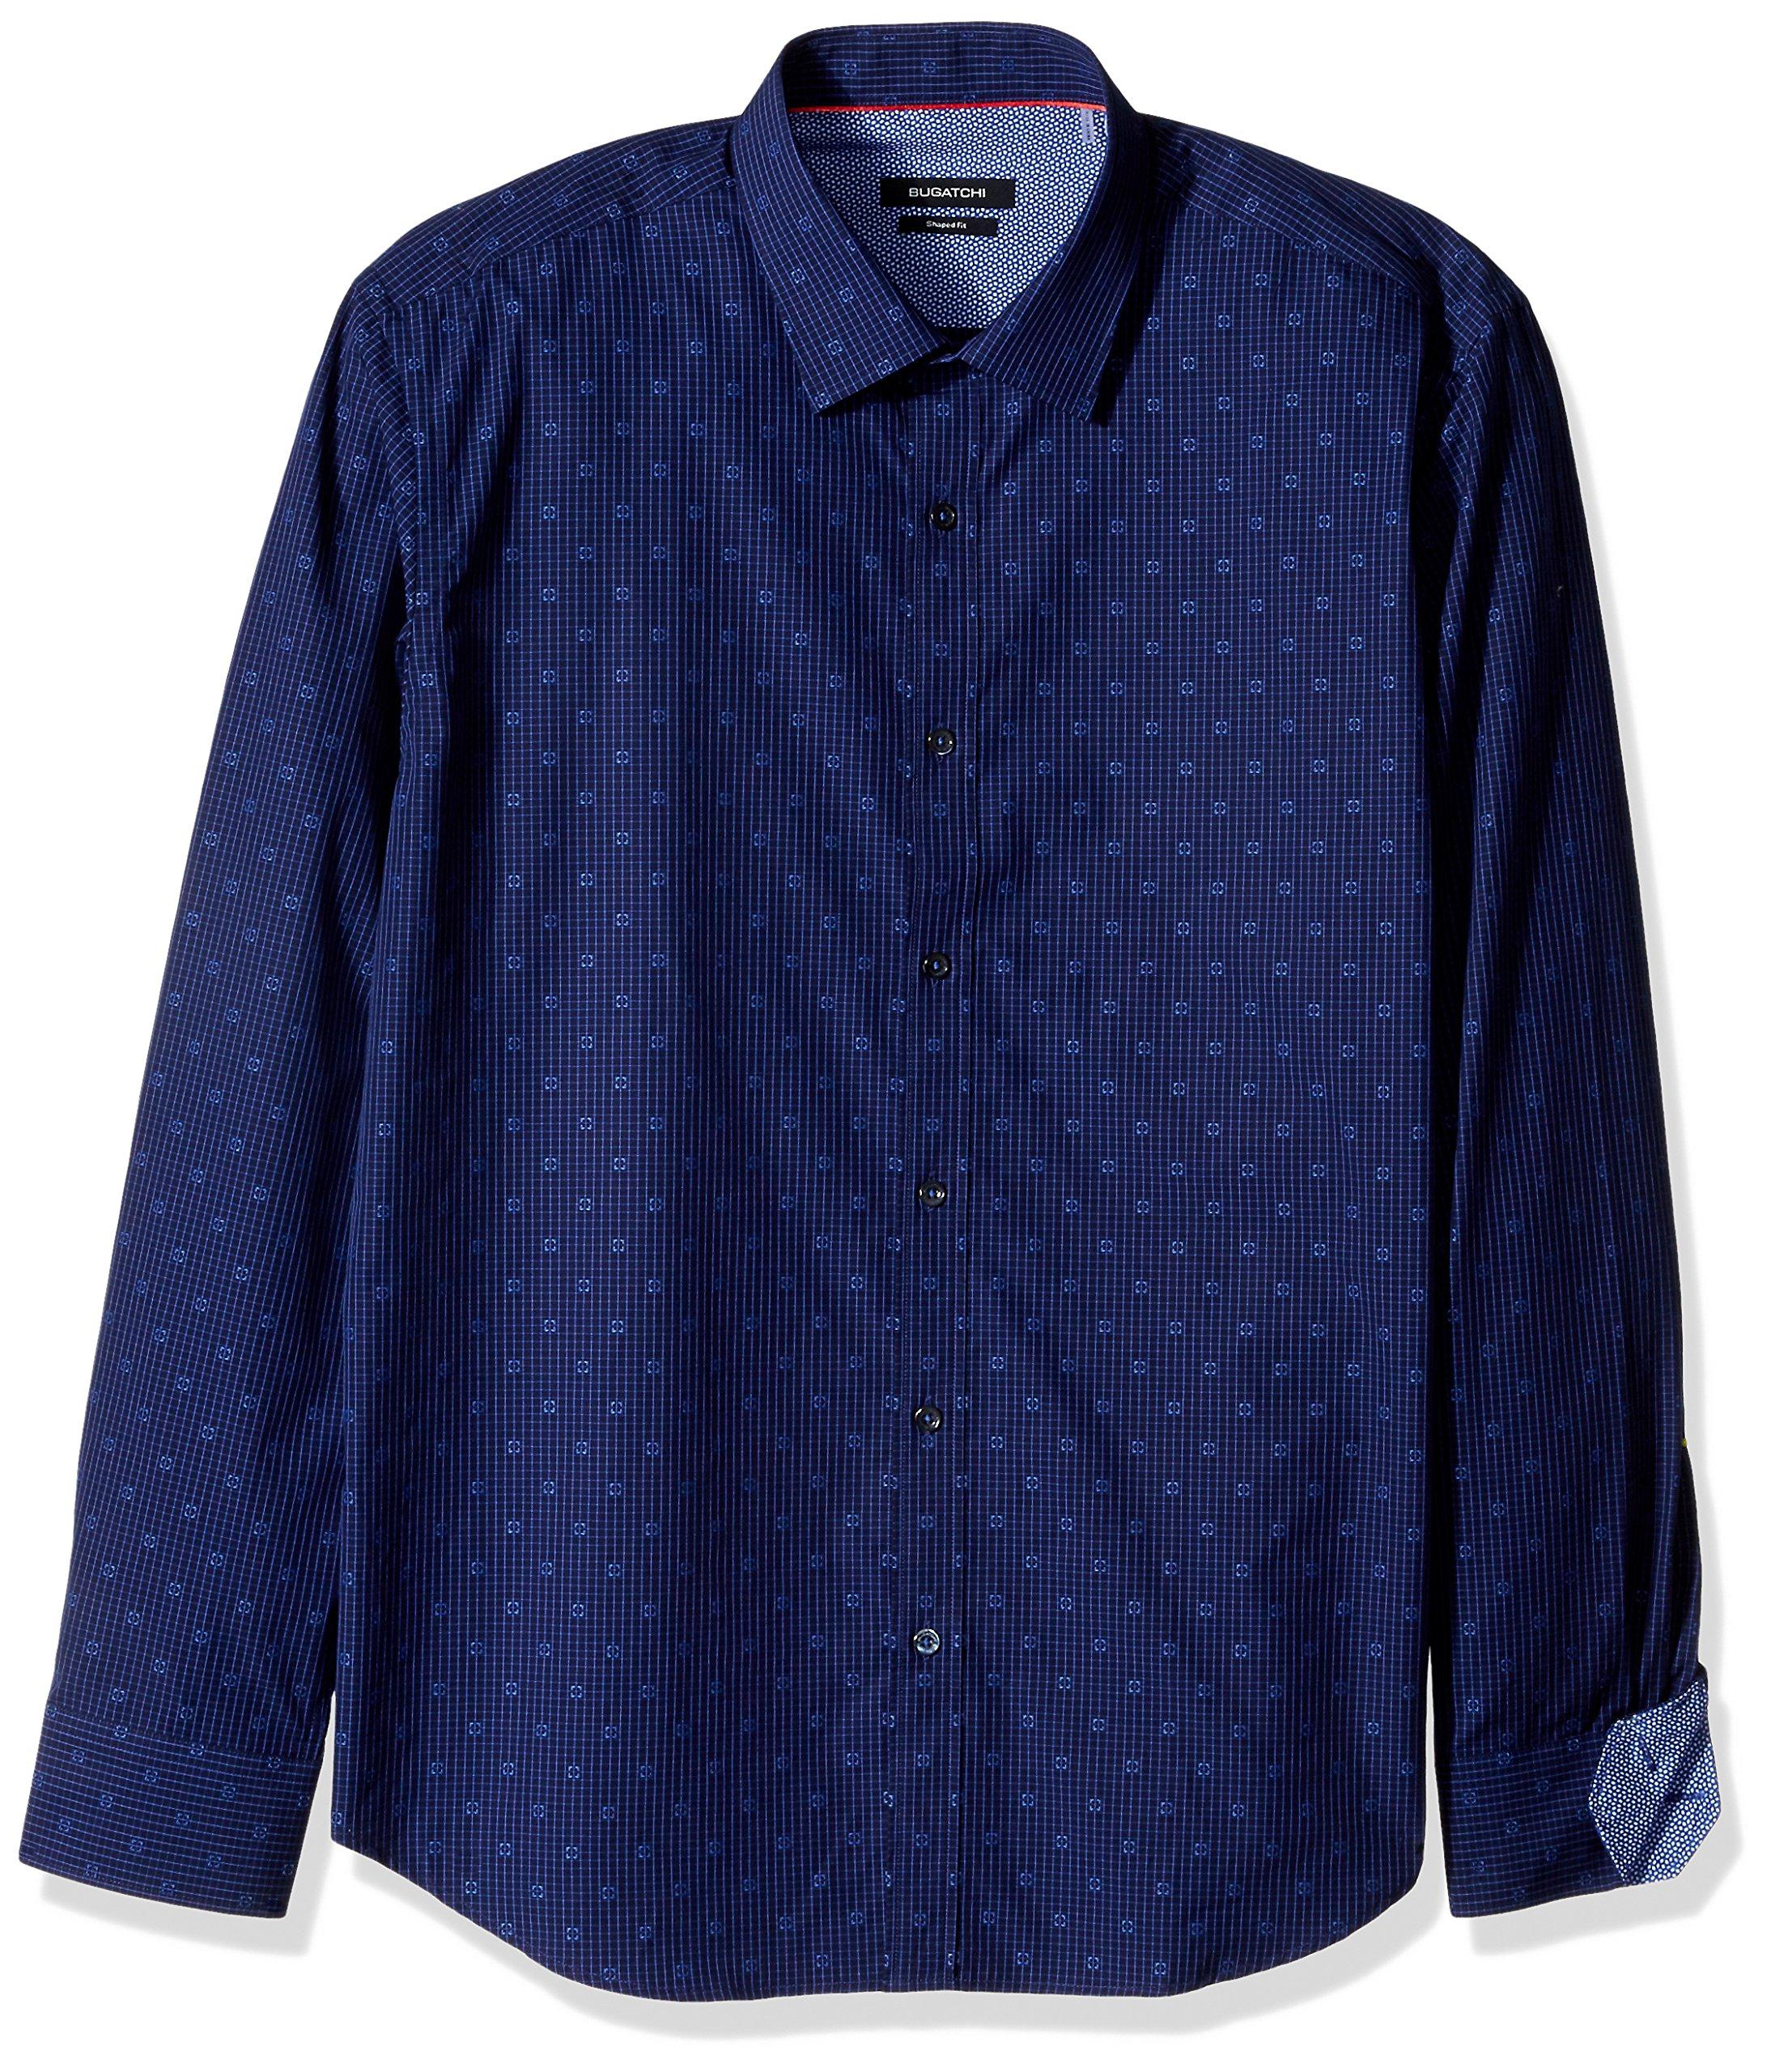 BUGATCHI Men's Long Sleeve Shaped Fit Point Collar Sport Woven Shirt, Midnight, M